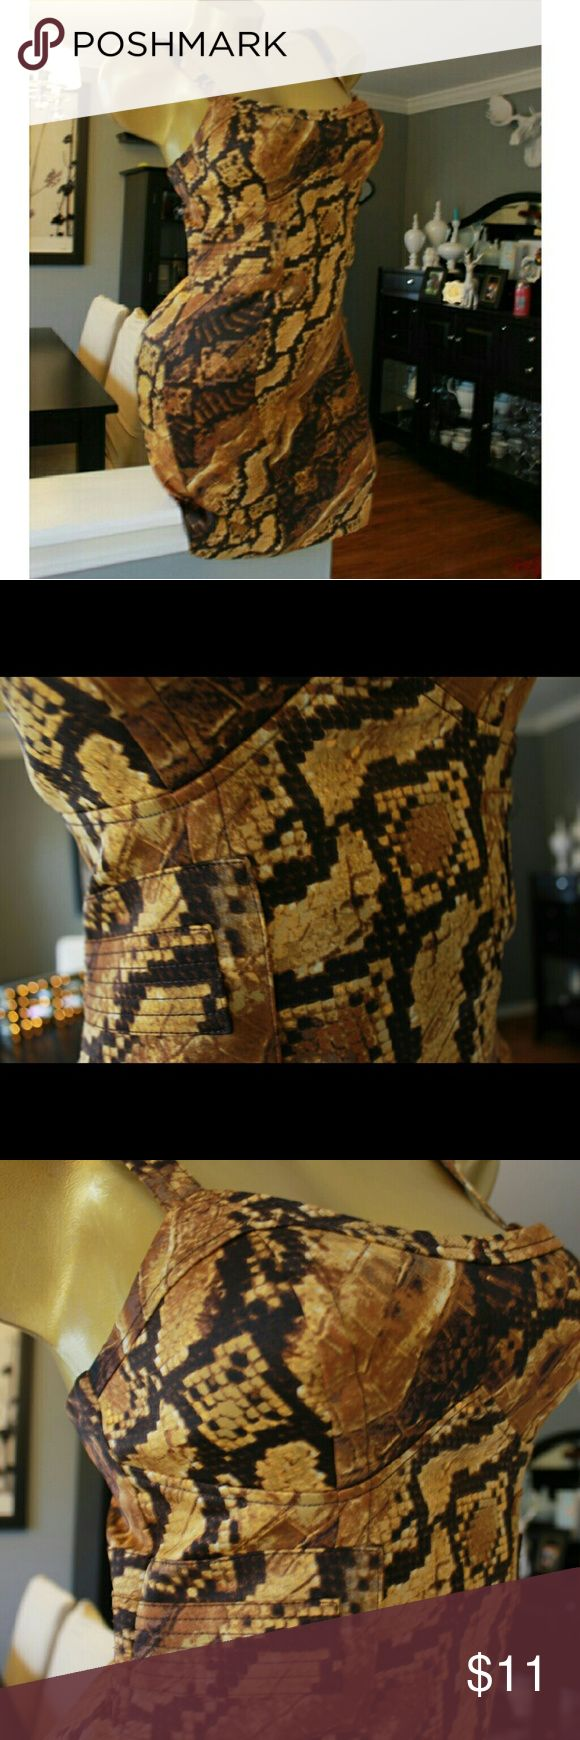 Xoxo Snake print dress Brown snake skin, say dress with a bustier look top Lightly worn Zipper back XOXO Dresses Mini